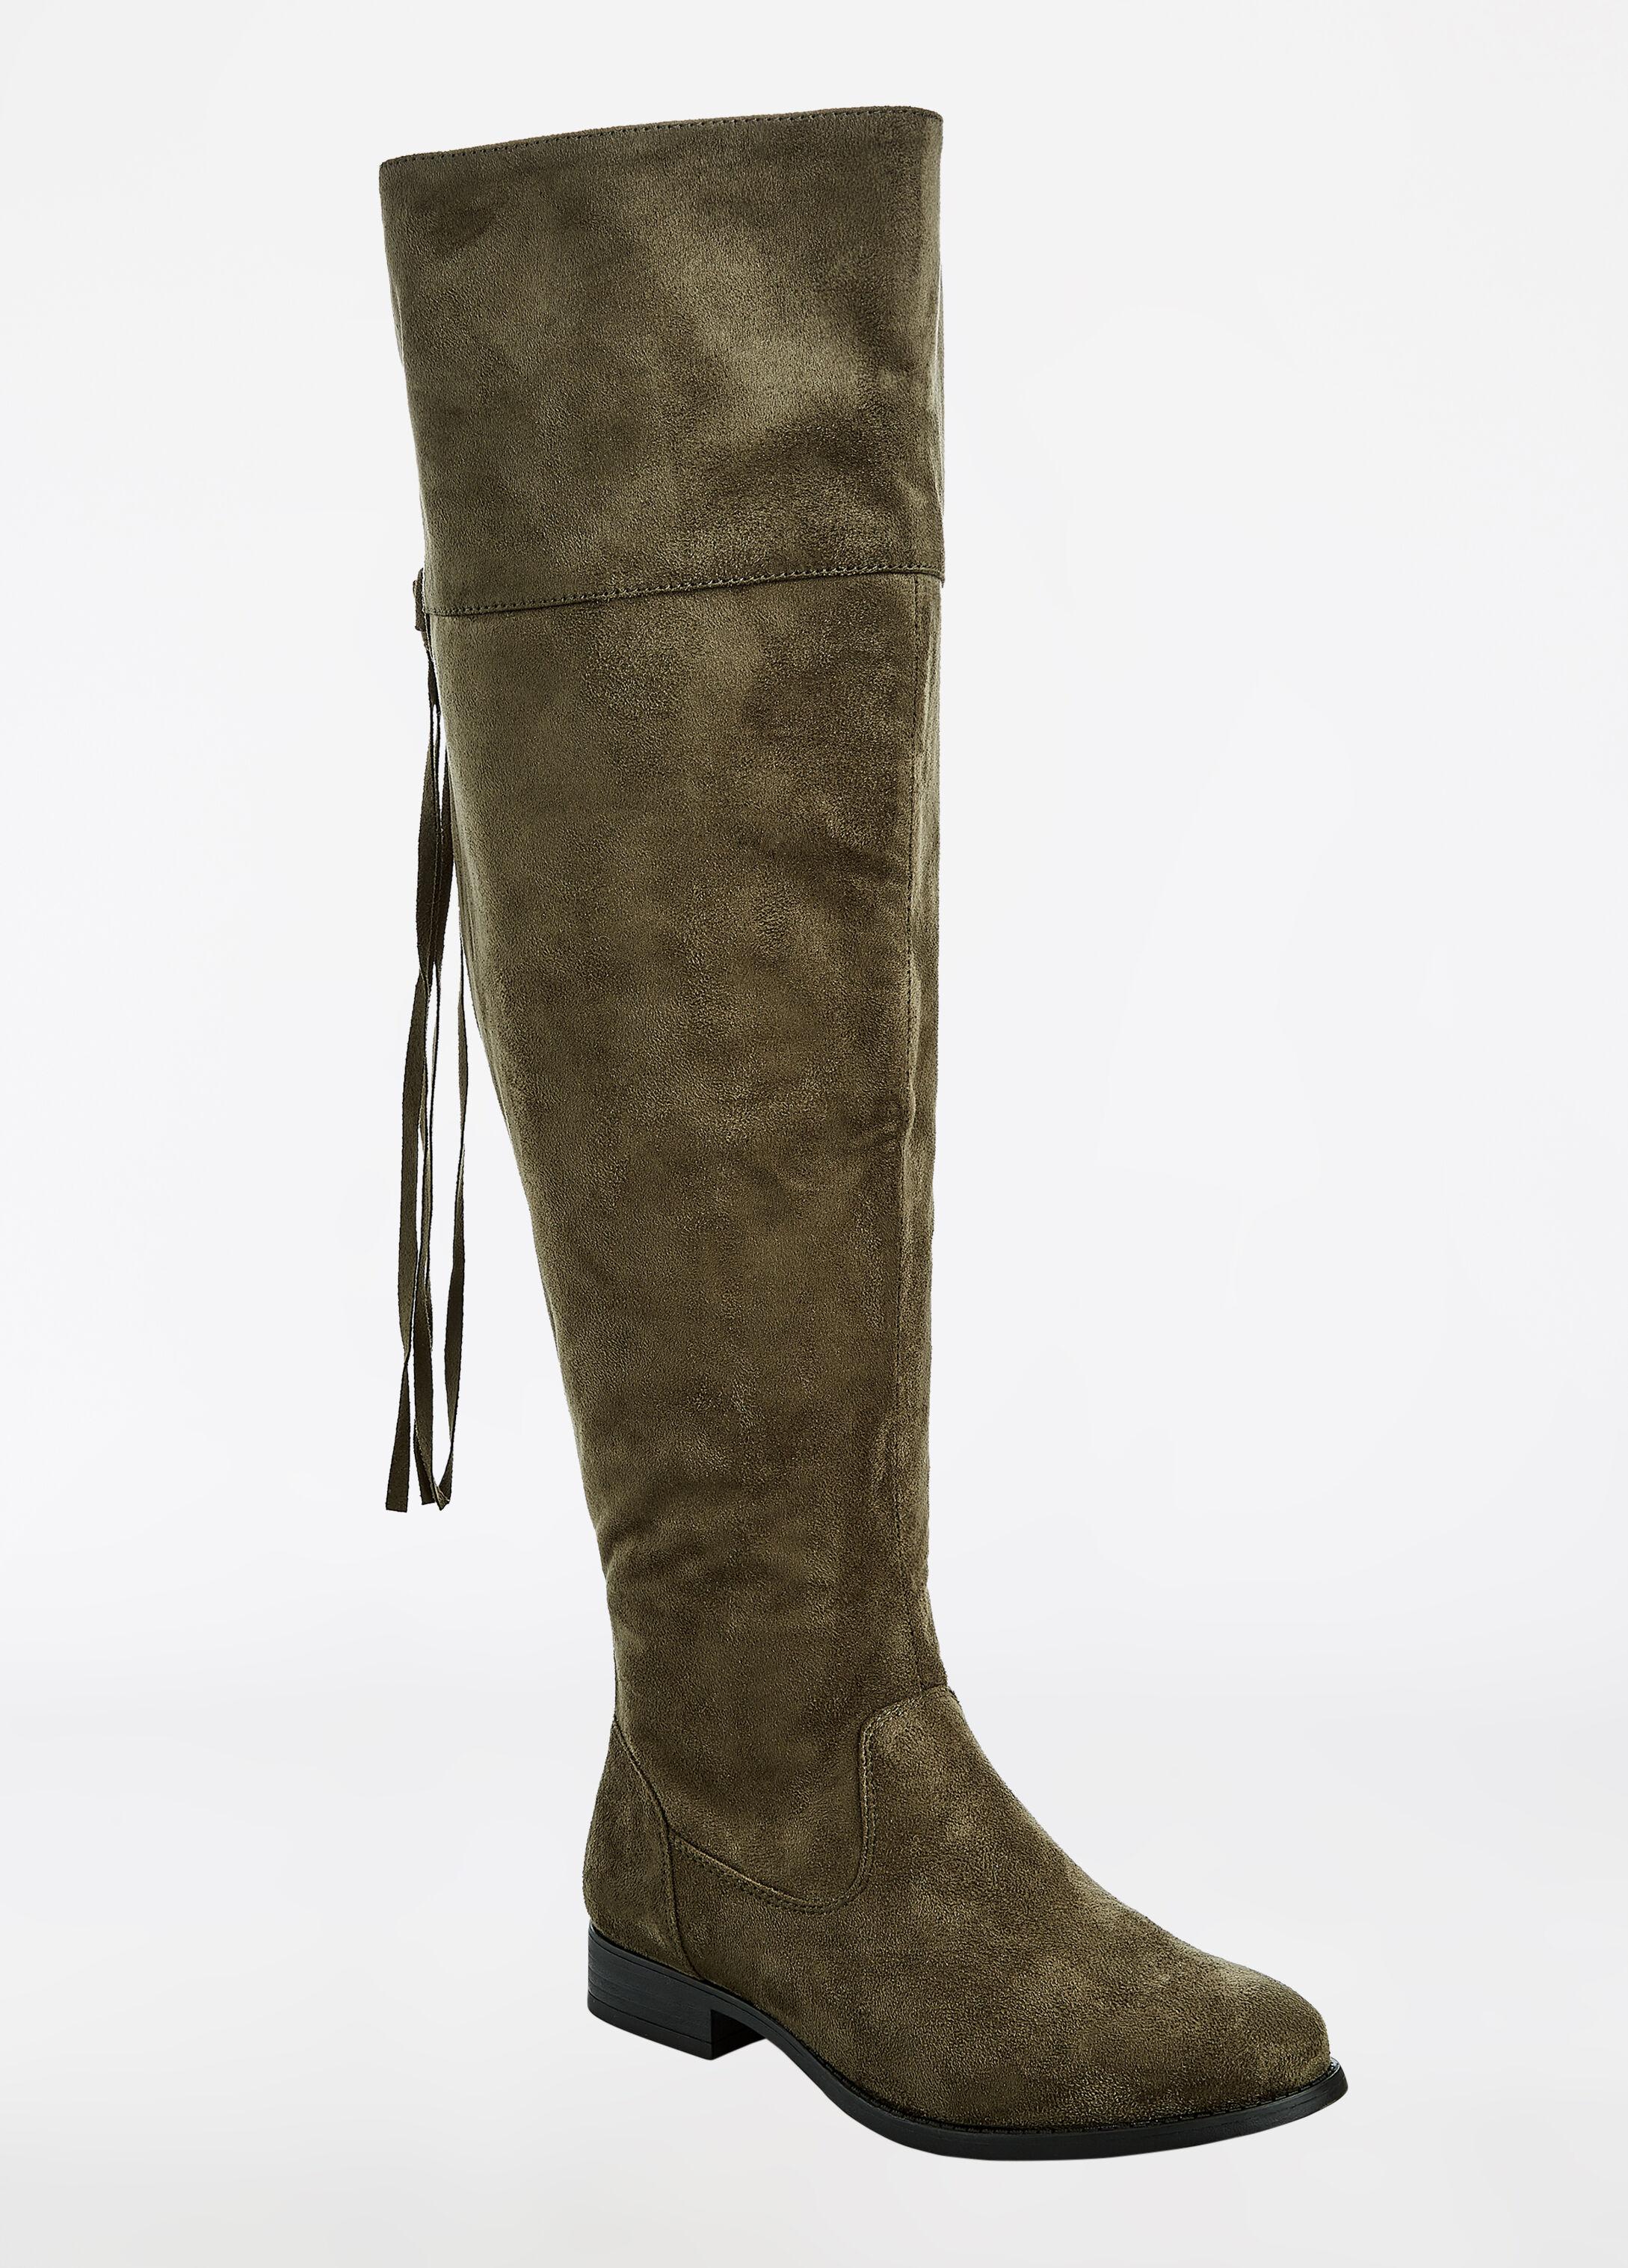 Faux Suede Boot - Wide Width - Wide Calf